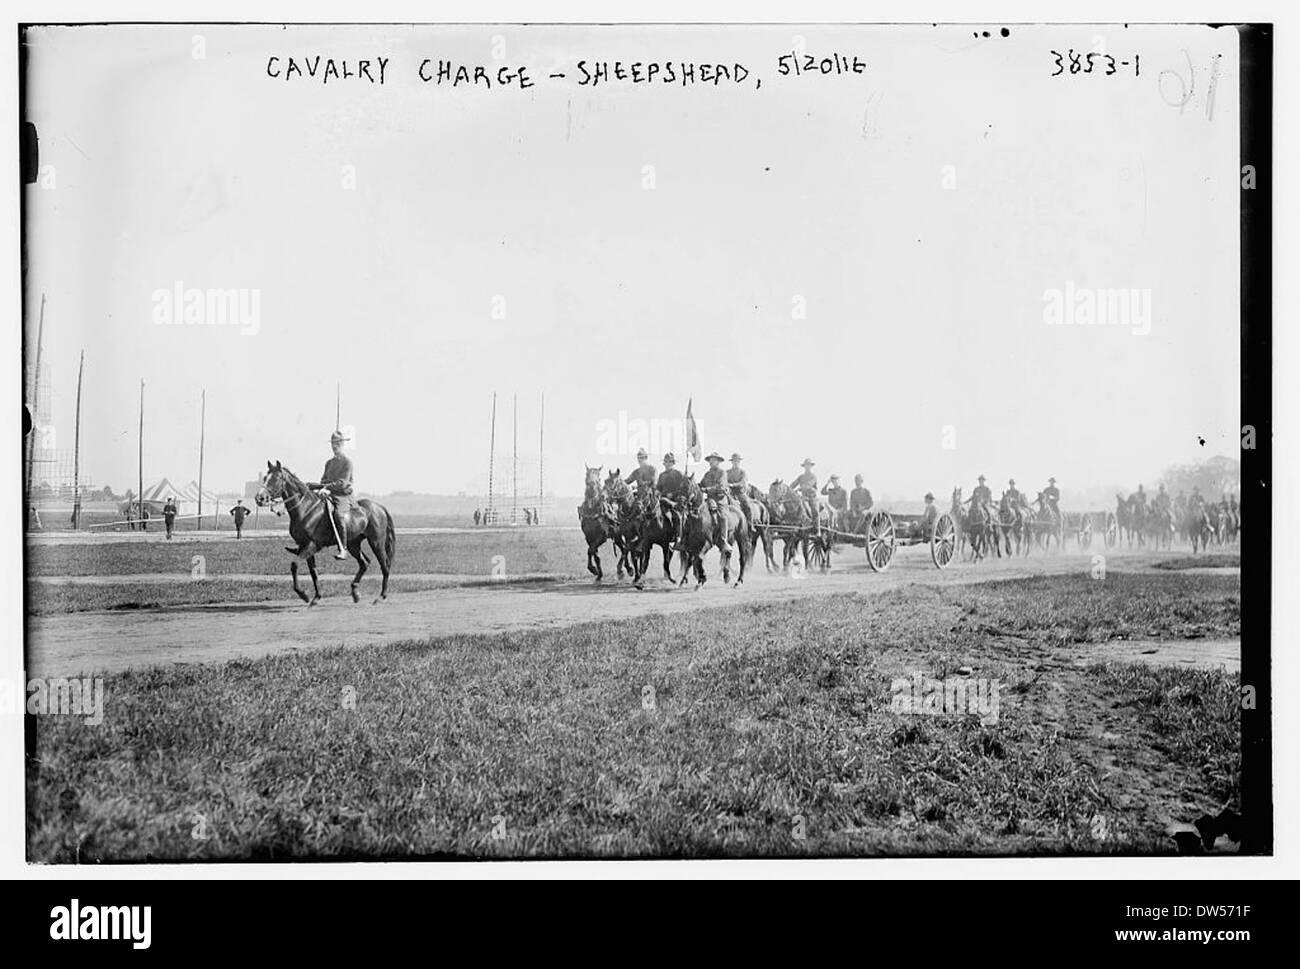 Cavalry Charge -- Sheepshead, 5/20/16 (LOC) - Stock Image